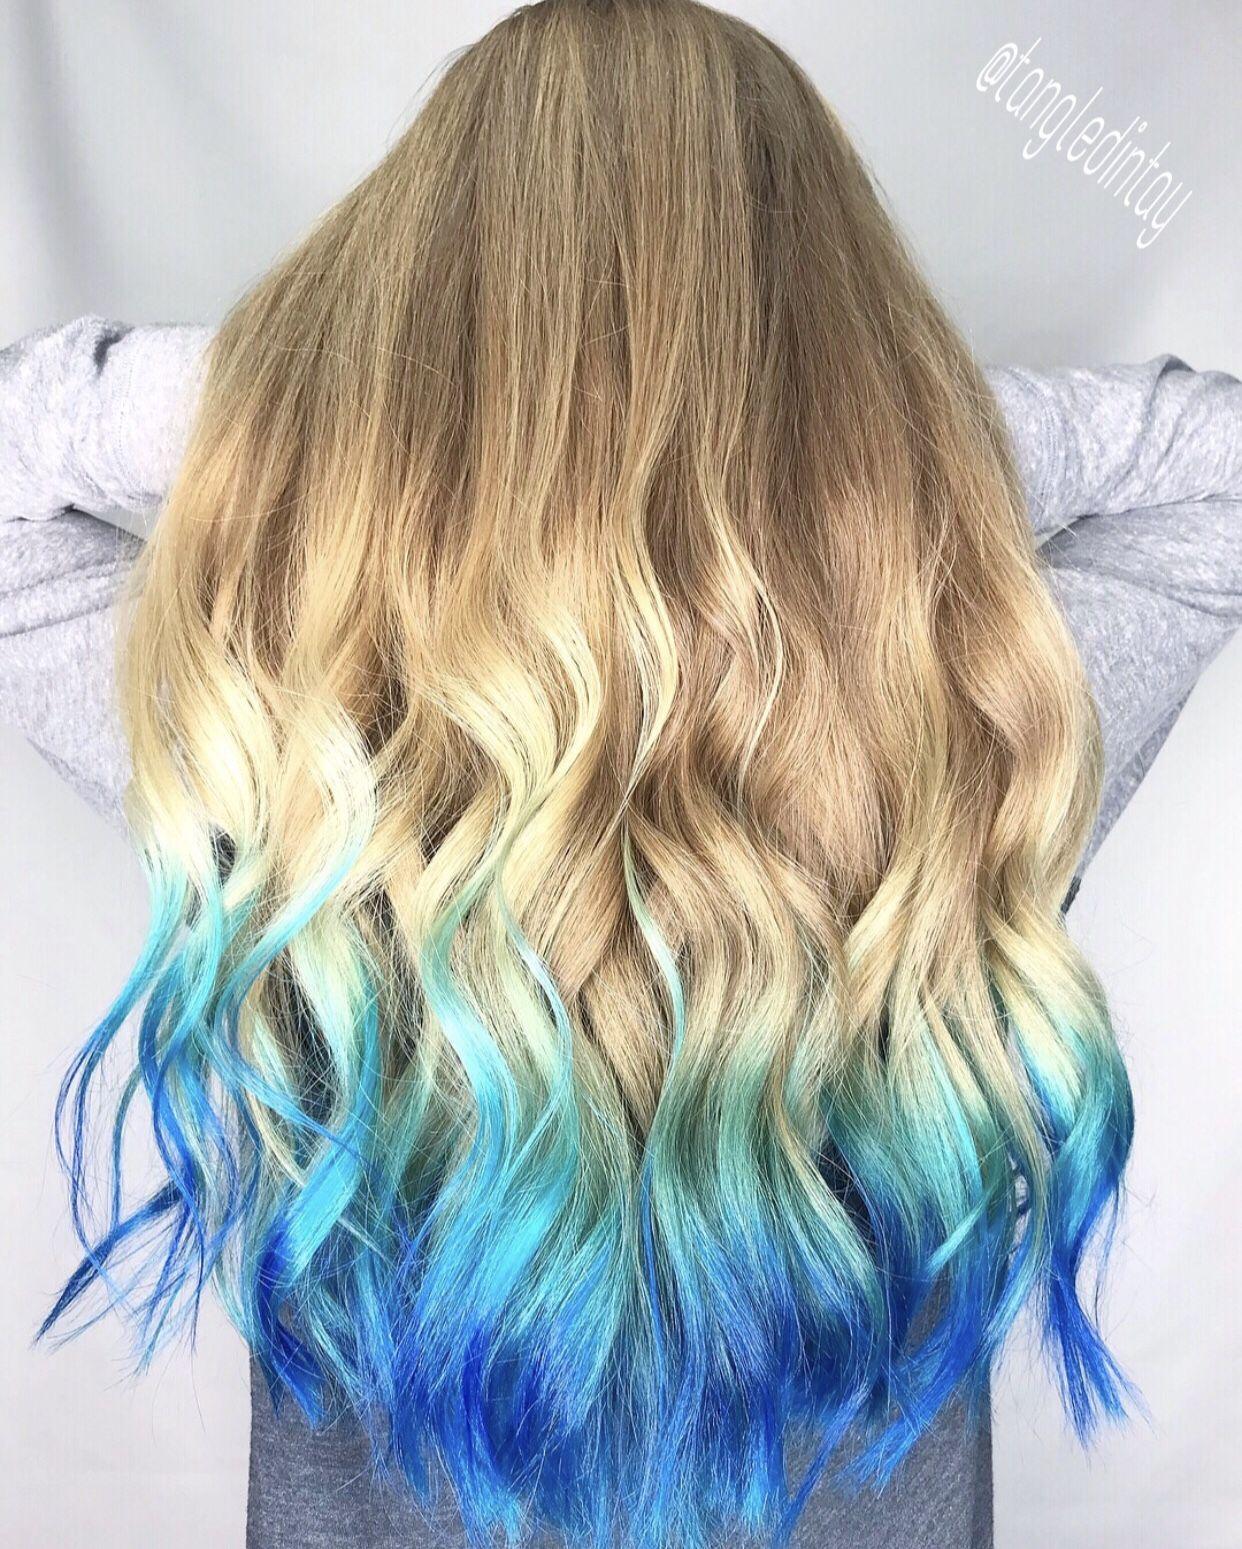 Mermaid Hair Bluehair Blue Ombre Colorombre Coloredhair Colorfulhair Fantasyhair Fantasycolors Hair Dye Tips Ombre Hair Blonde Colored Hair Tips